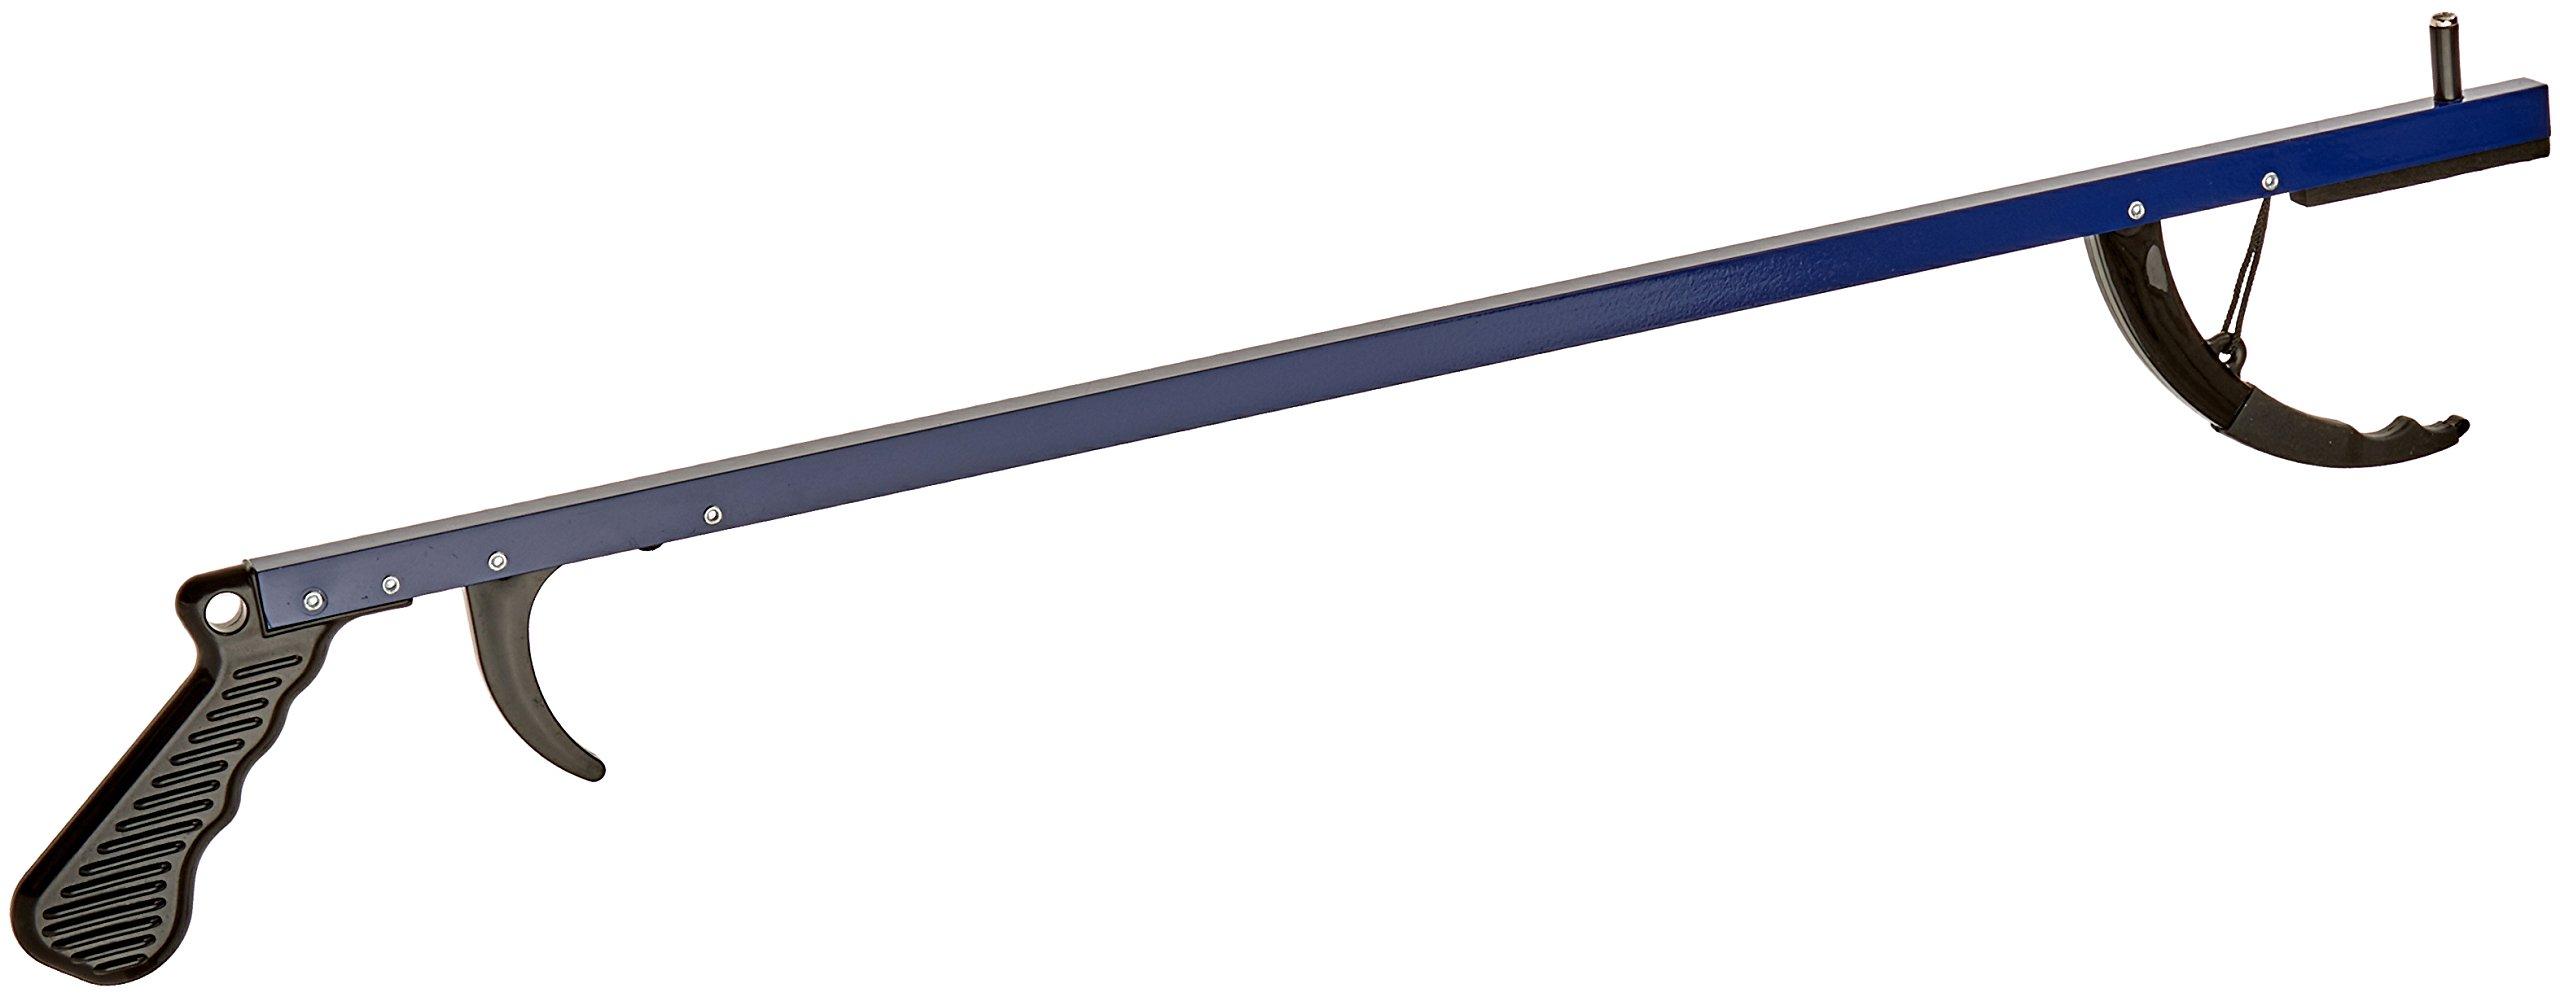 Sammons Preston Reacher, Lightweight Blue 26'' Long Handled Extension Grabber Tool, 6 oz. Handy Picker Up Tool and Reaching Claw, Aluminum Trash Pickup Aid & Garden Nabber, Reaching Assist Tool